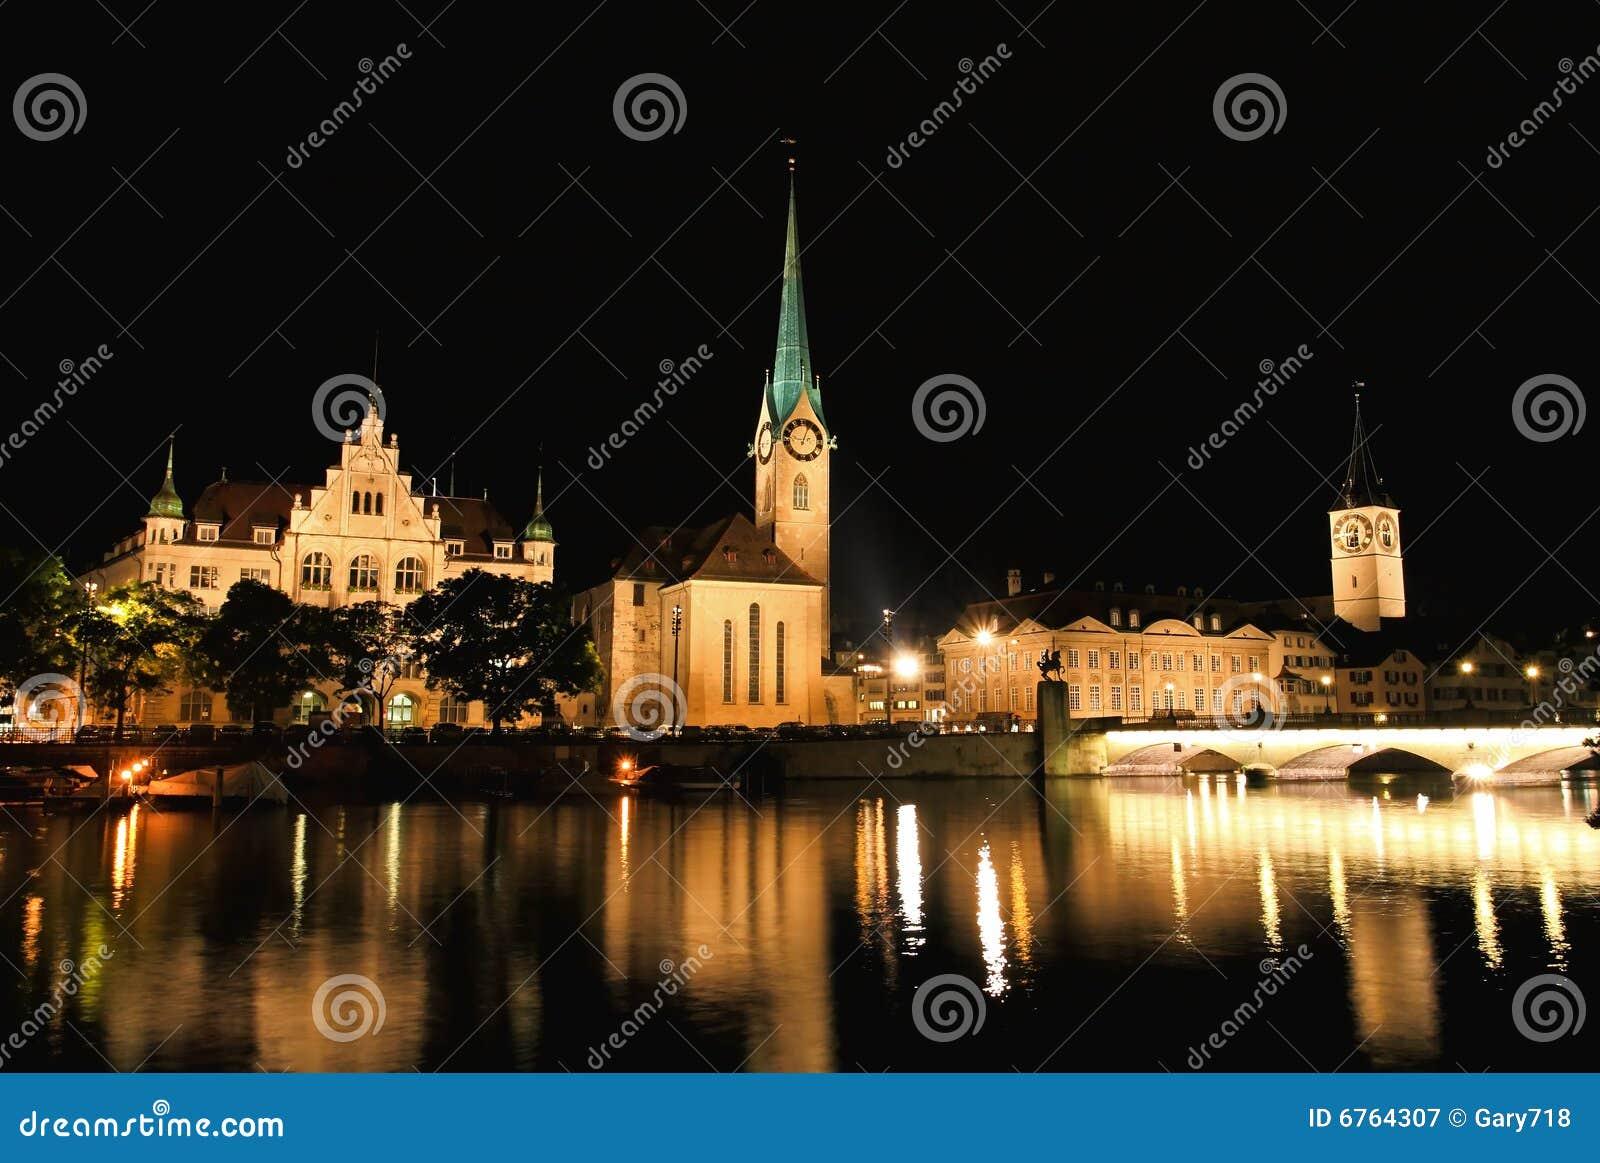 The night view of major landmarks in Zurich